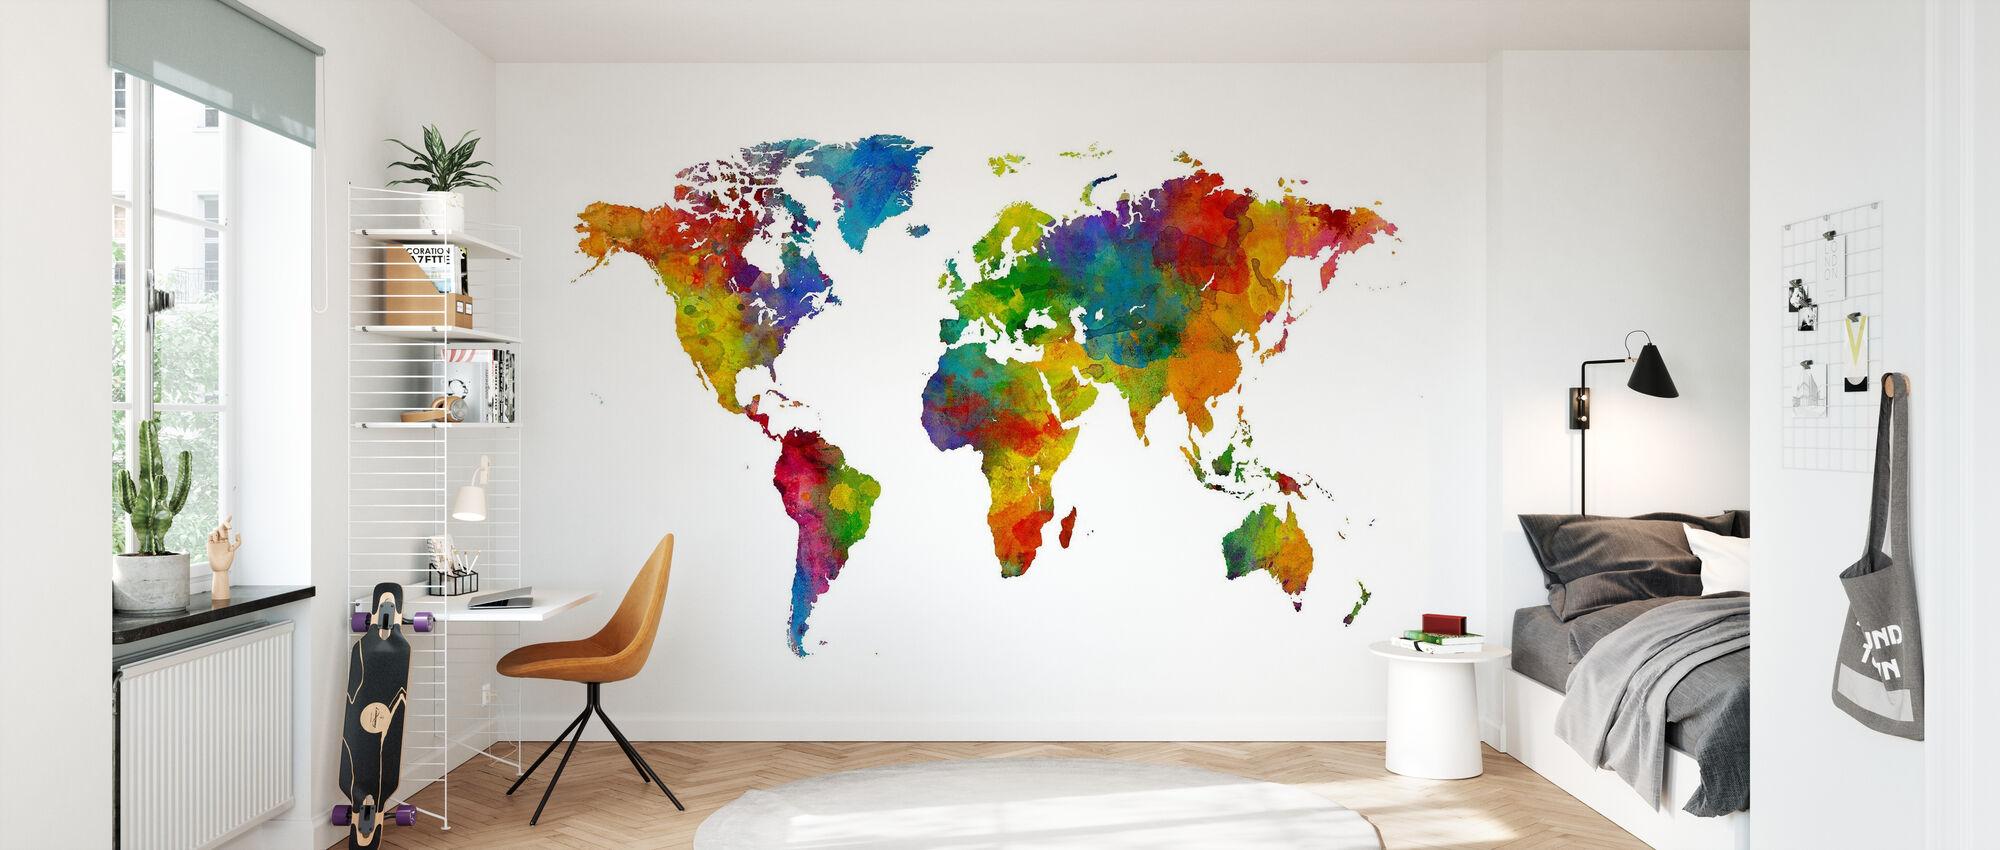 Watercolour World Map Multicolour - Wallpaper - Kids Room